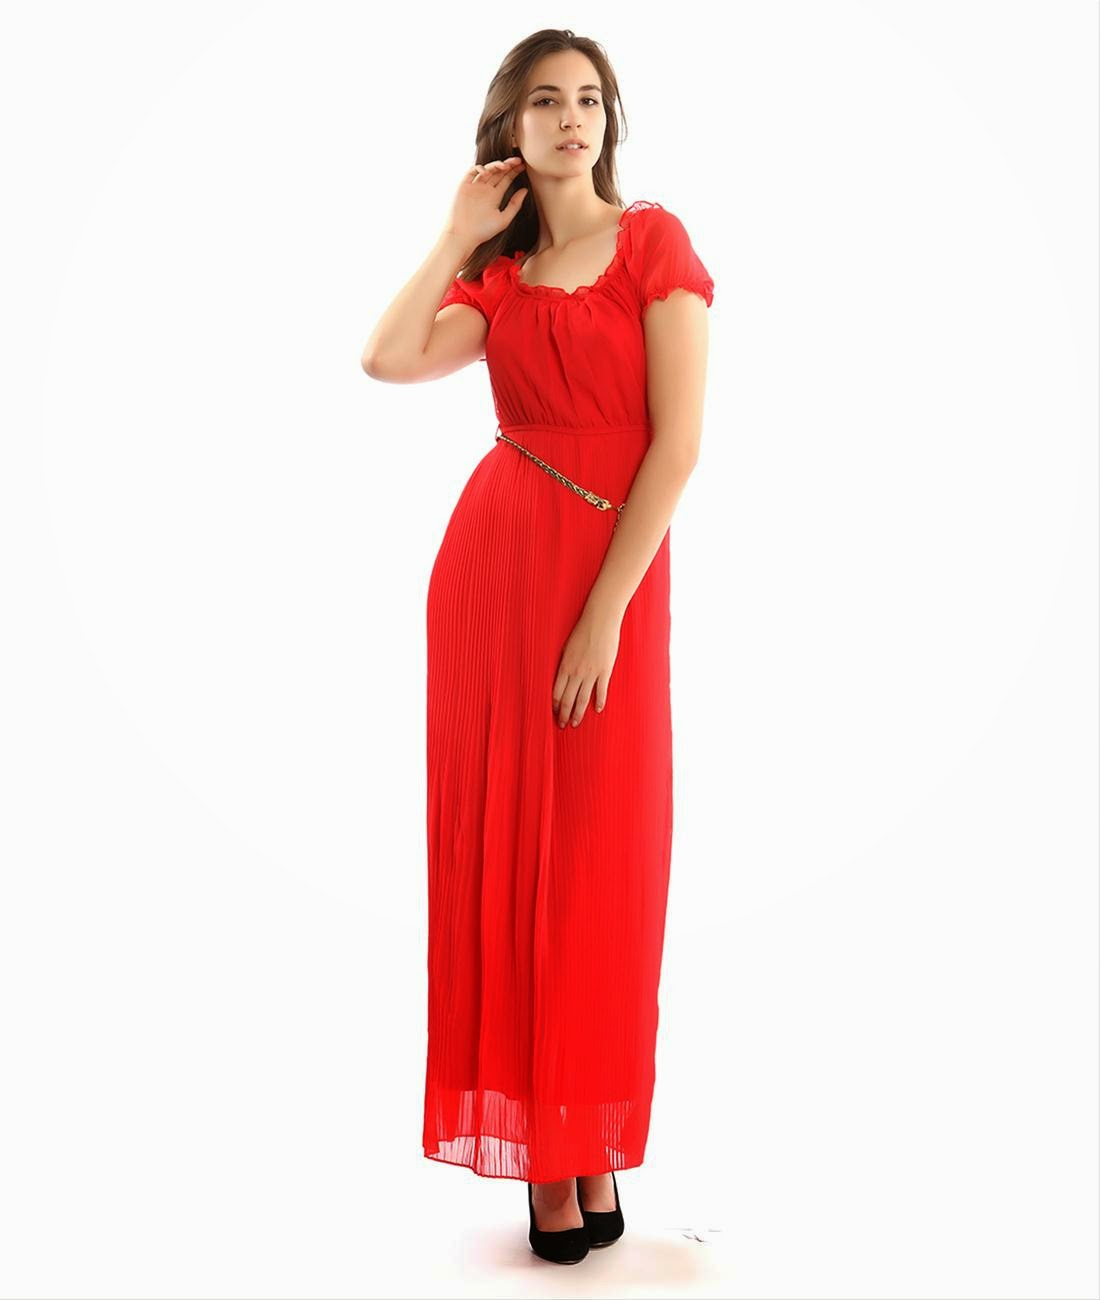 collezione 2015 elbise modelleri, kısa elbise, uzun elbise, dar elbise, desenli elbise, siyah elbise, kırmızı elbise, mavi elbise,